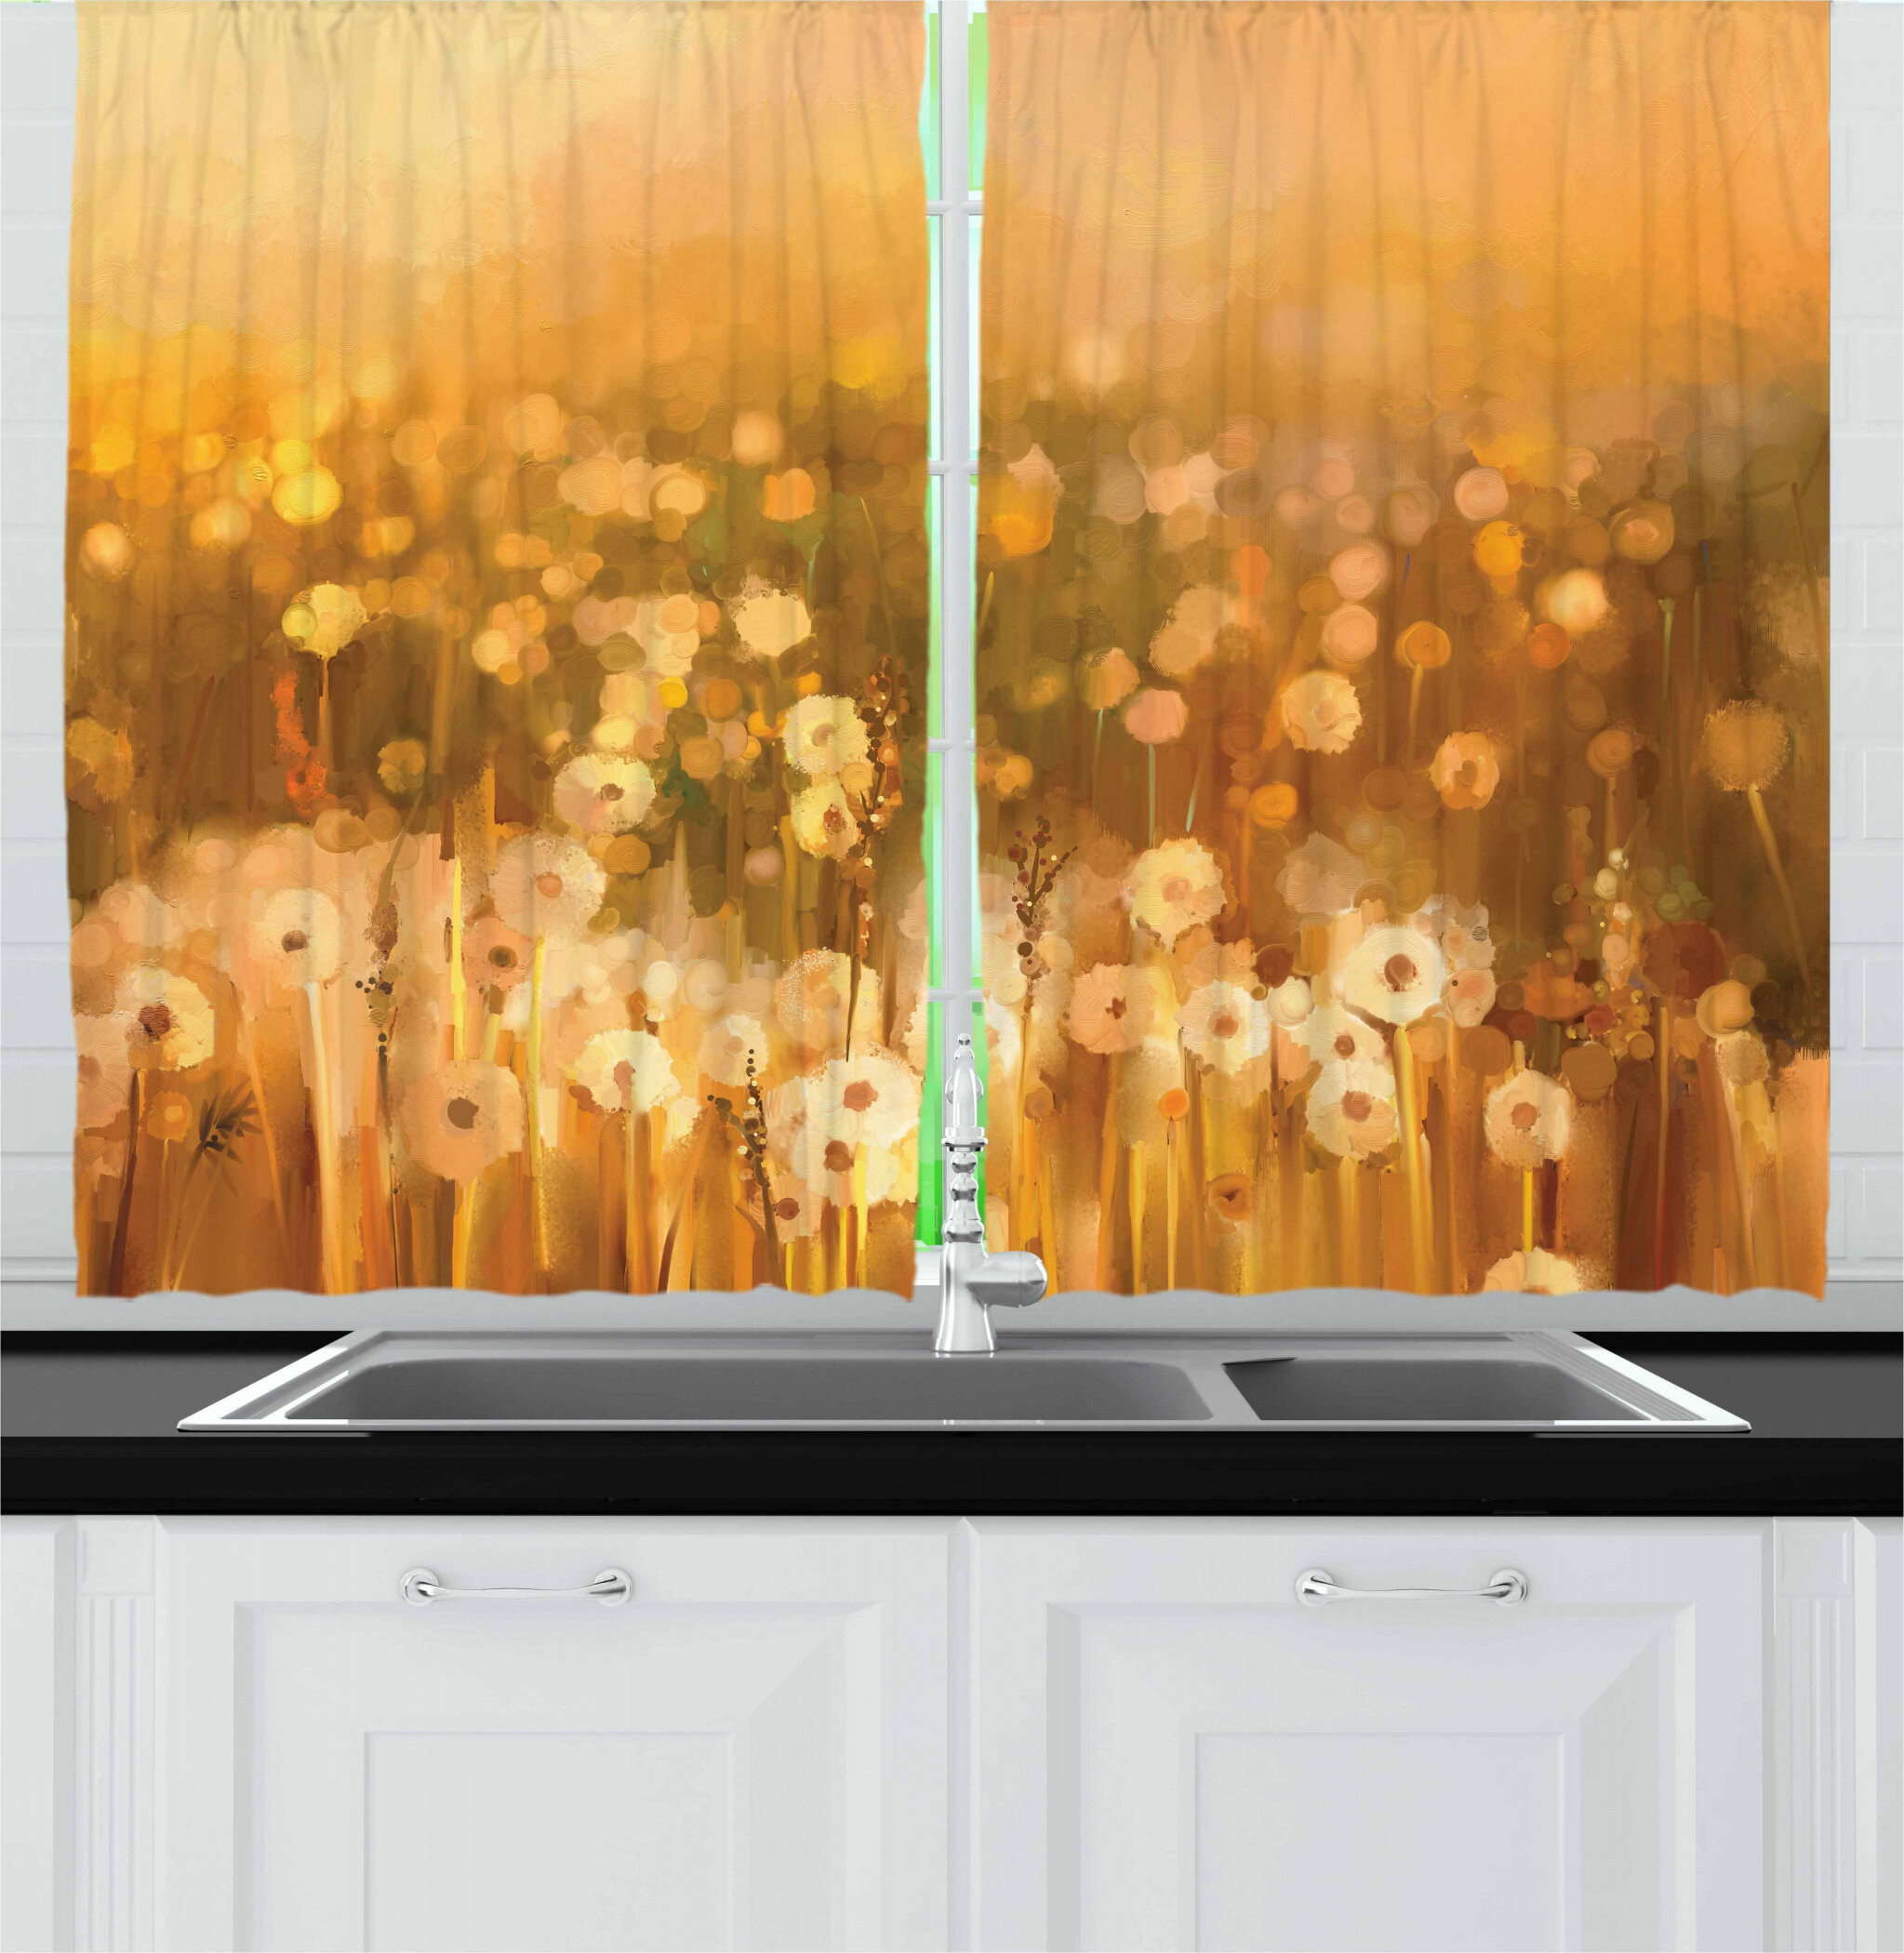 Dandelion Cafe Curtains Kitchen Cafe Curtains Window Curtain Premier Print Dandelion Curtains